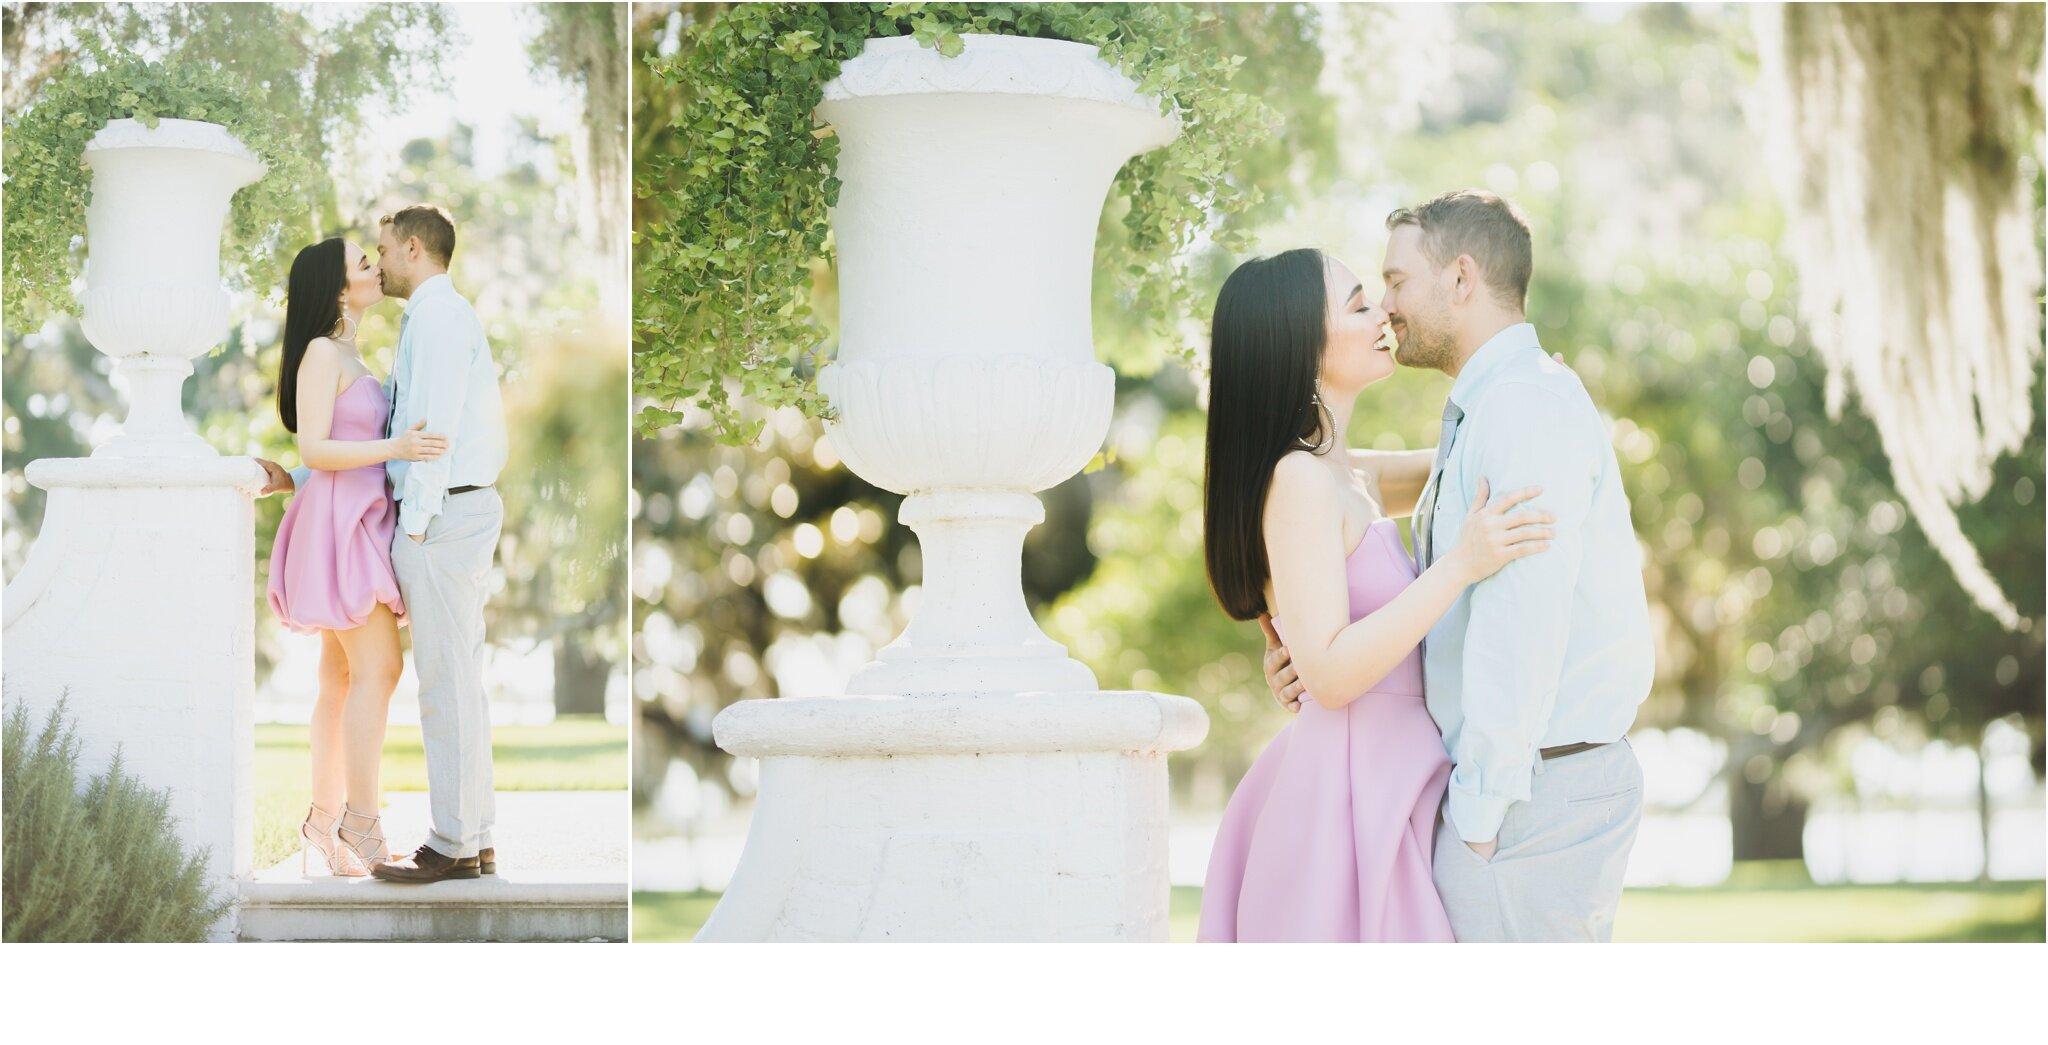 Rainey_Gregg_Photography_St._Simons_Island_Georgia_California_Wedding_Portrait_Photography_1822.jpg